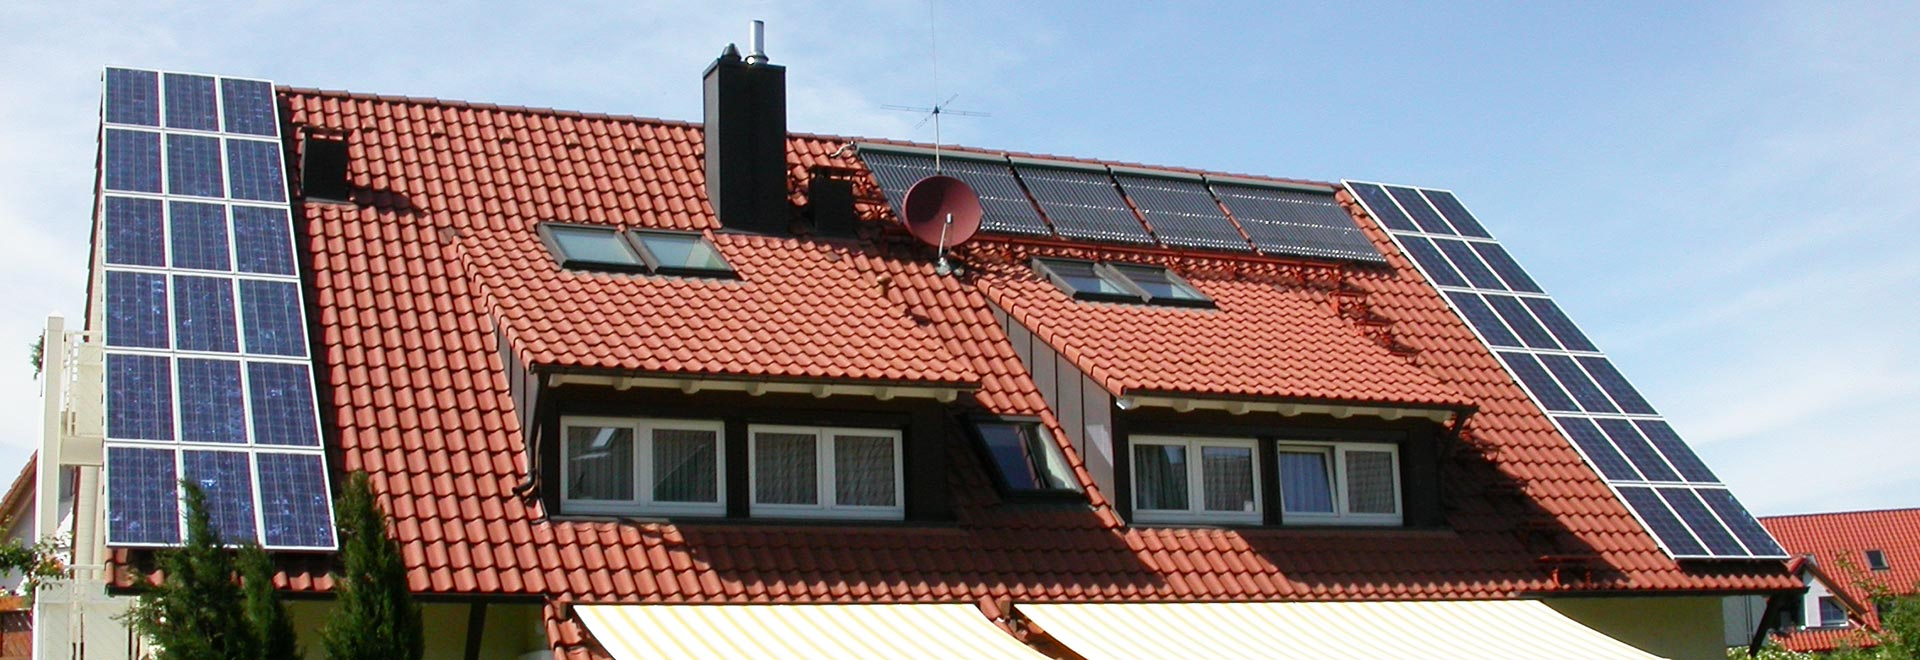 Walter Vögele GmbH in Freiburg: Solarenergie